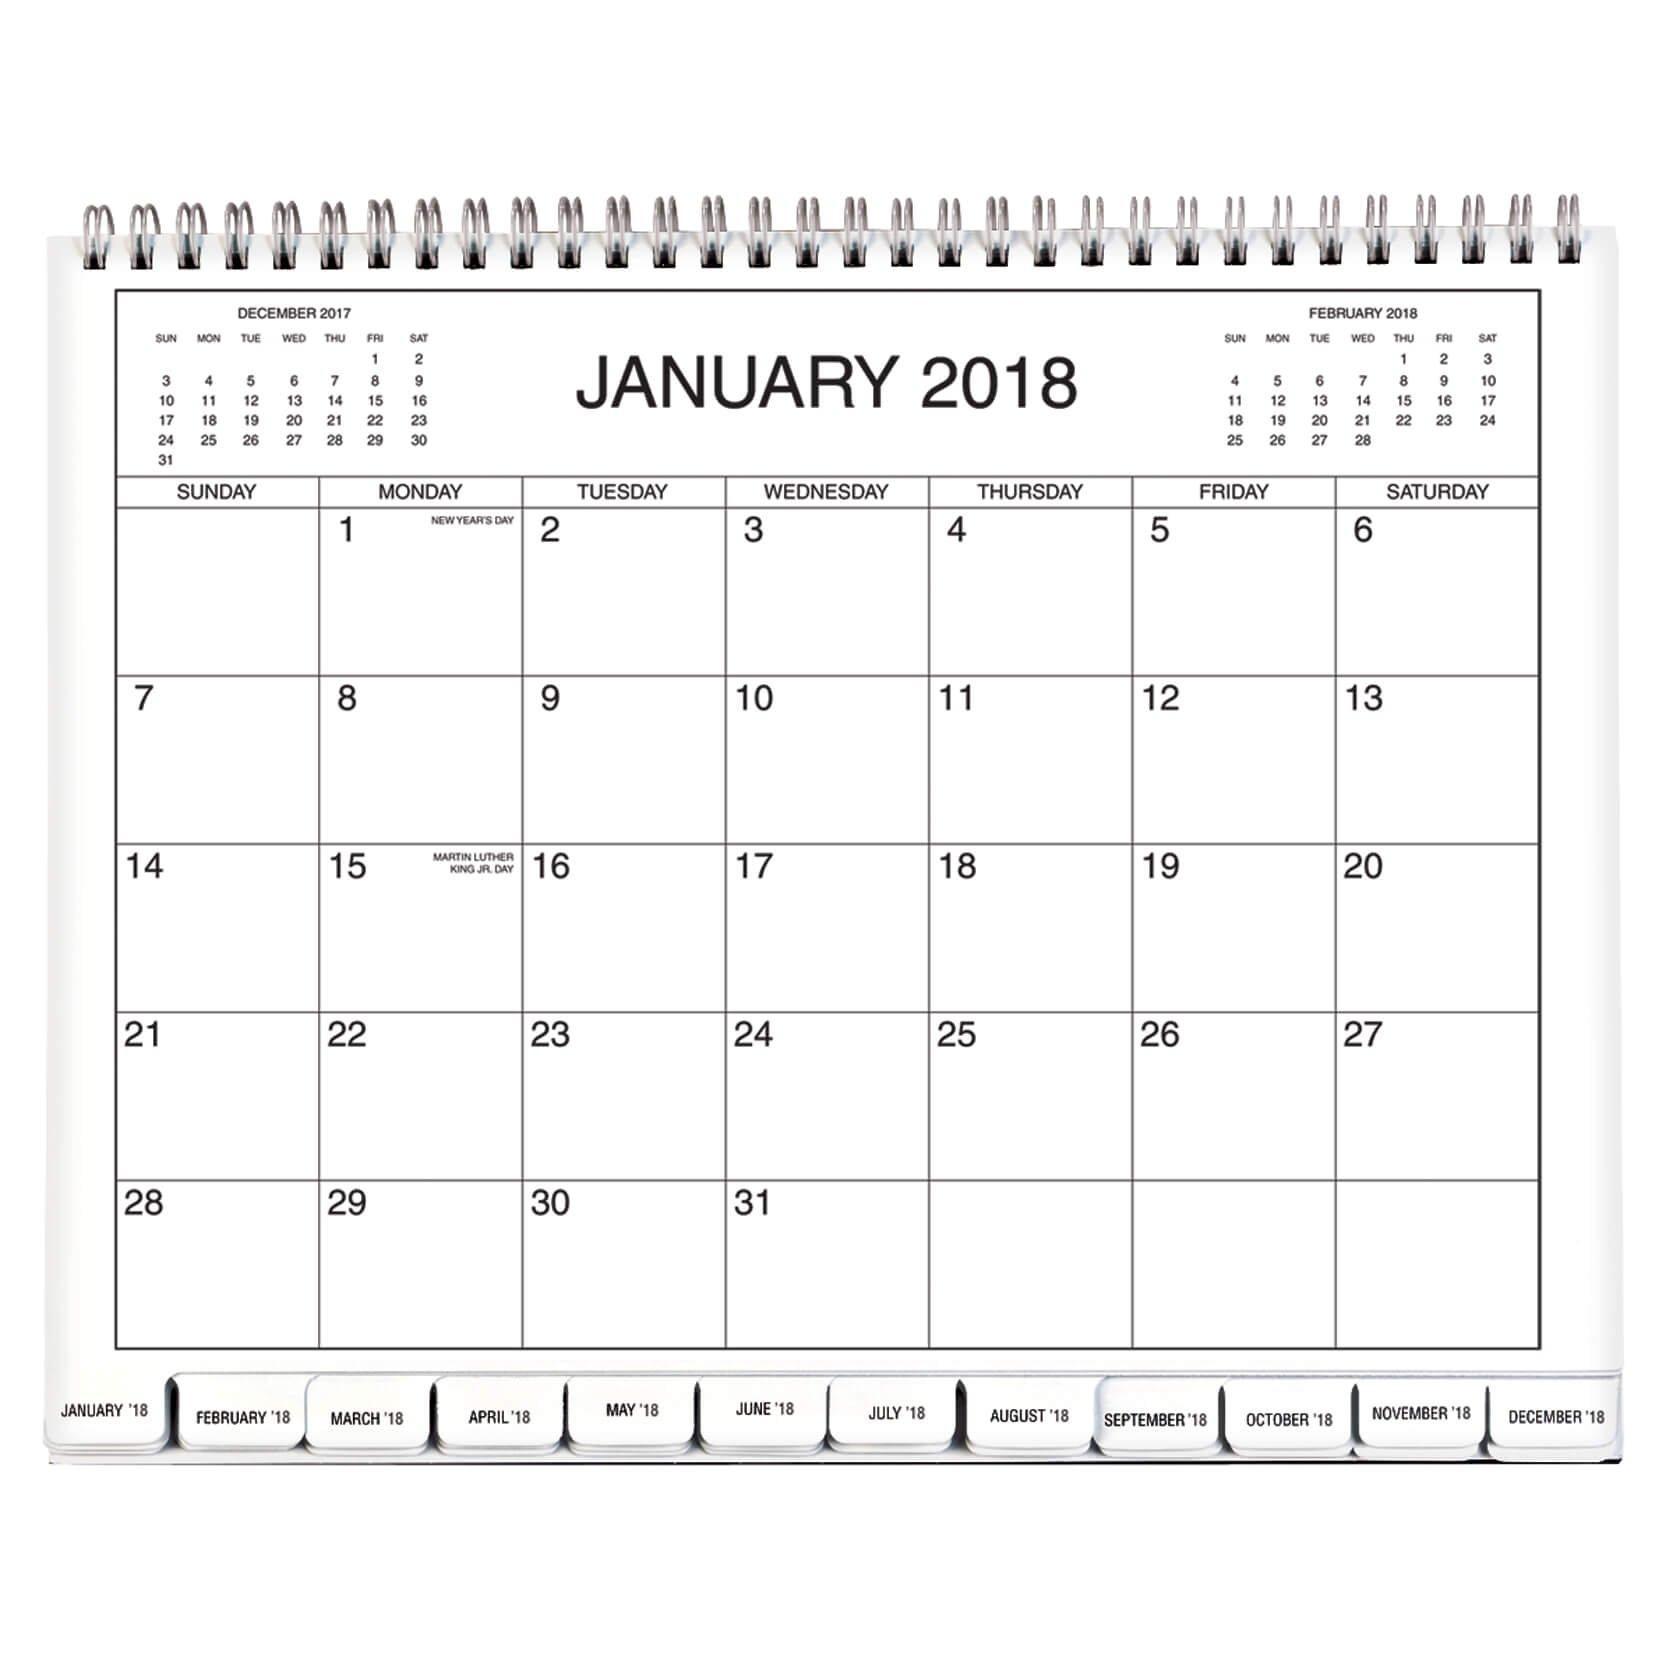 5 Year Calendar 2018 2019 2020 2021 2022 – Monthly Calendar – Walter Calendar 2019 Write In